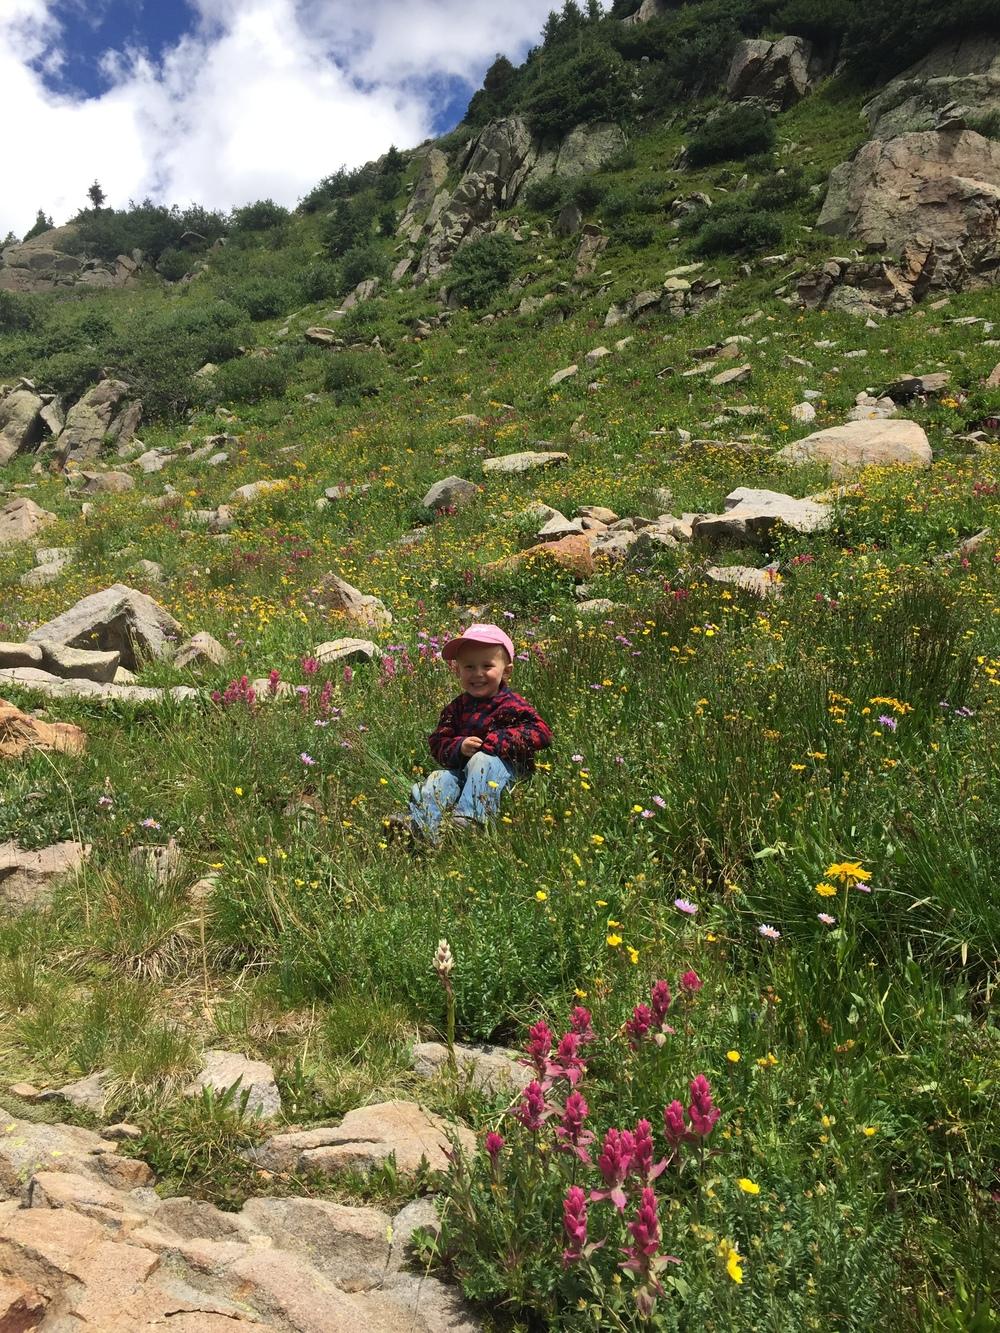 At Hope Lake near Telluride,Colorado.